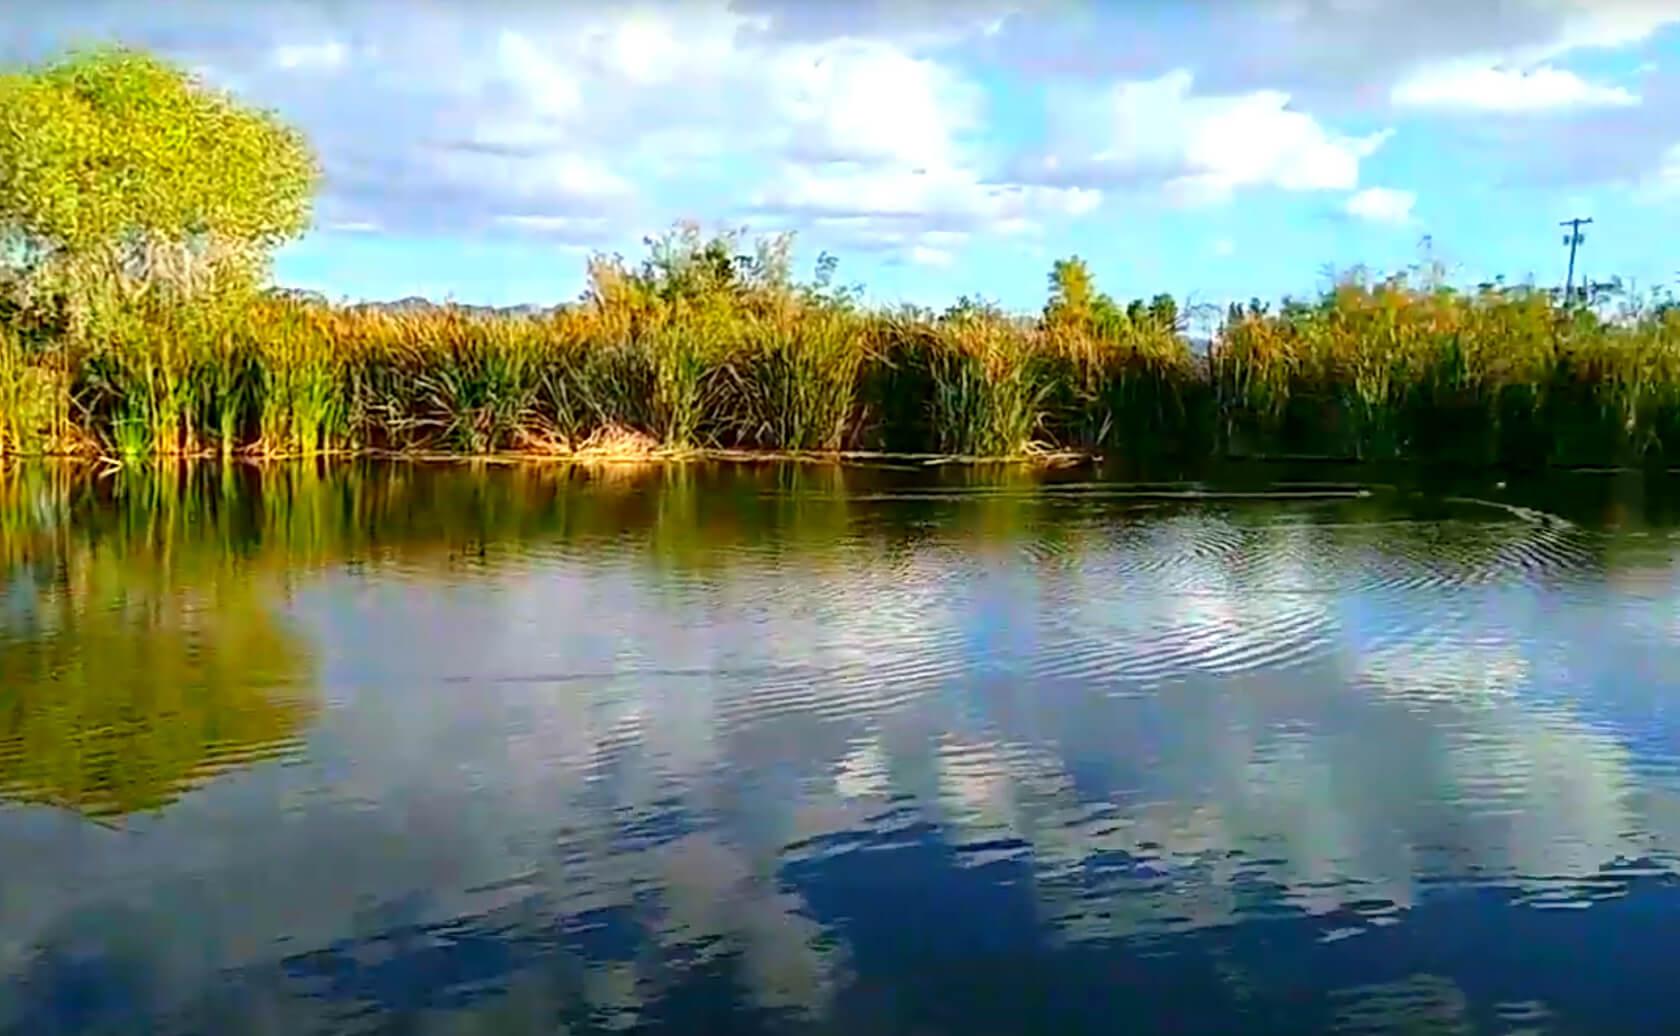 Fortuna-Lake-Fishing-Guide-Report-Yuma-AZ-02